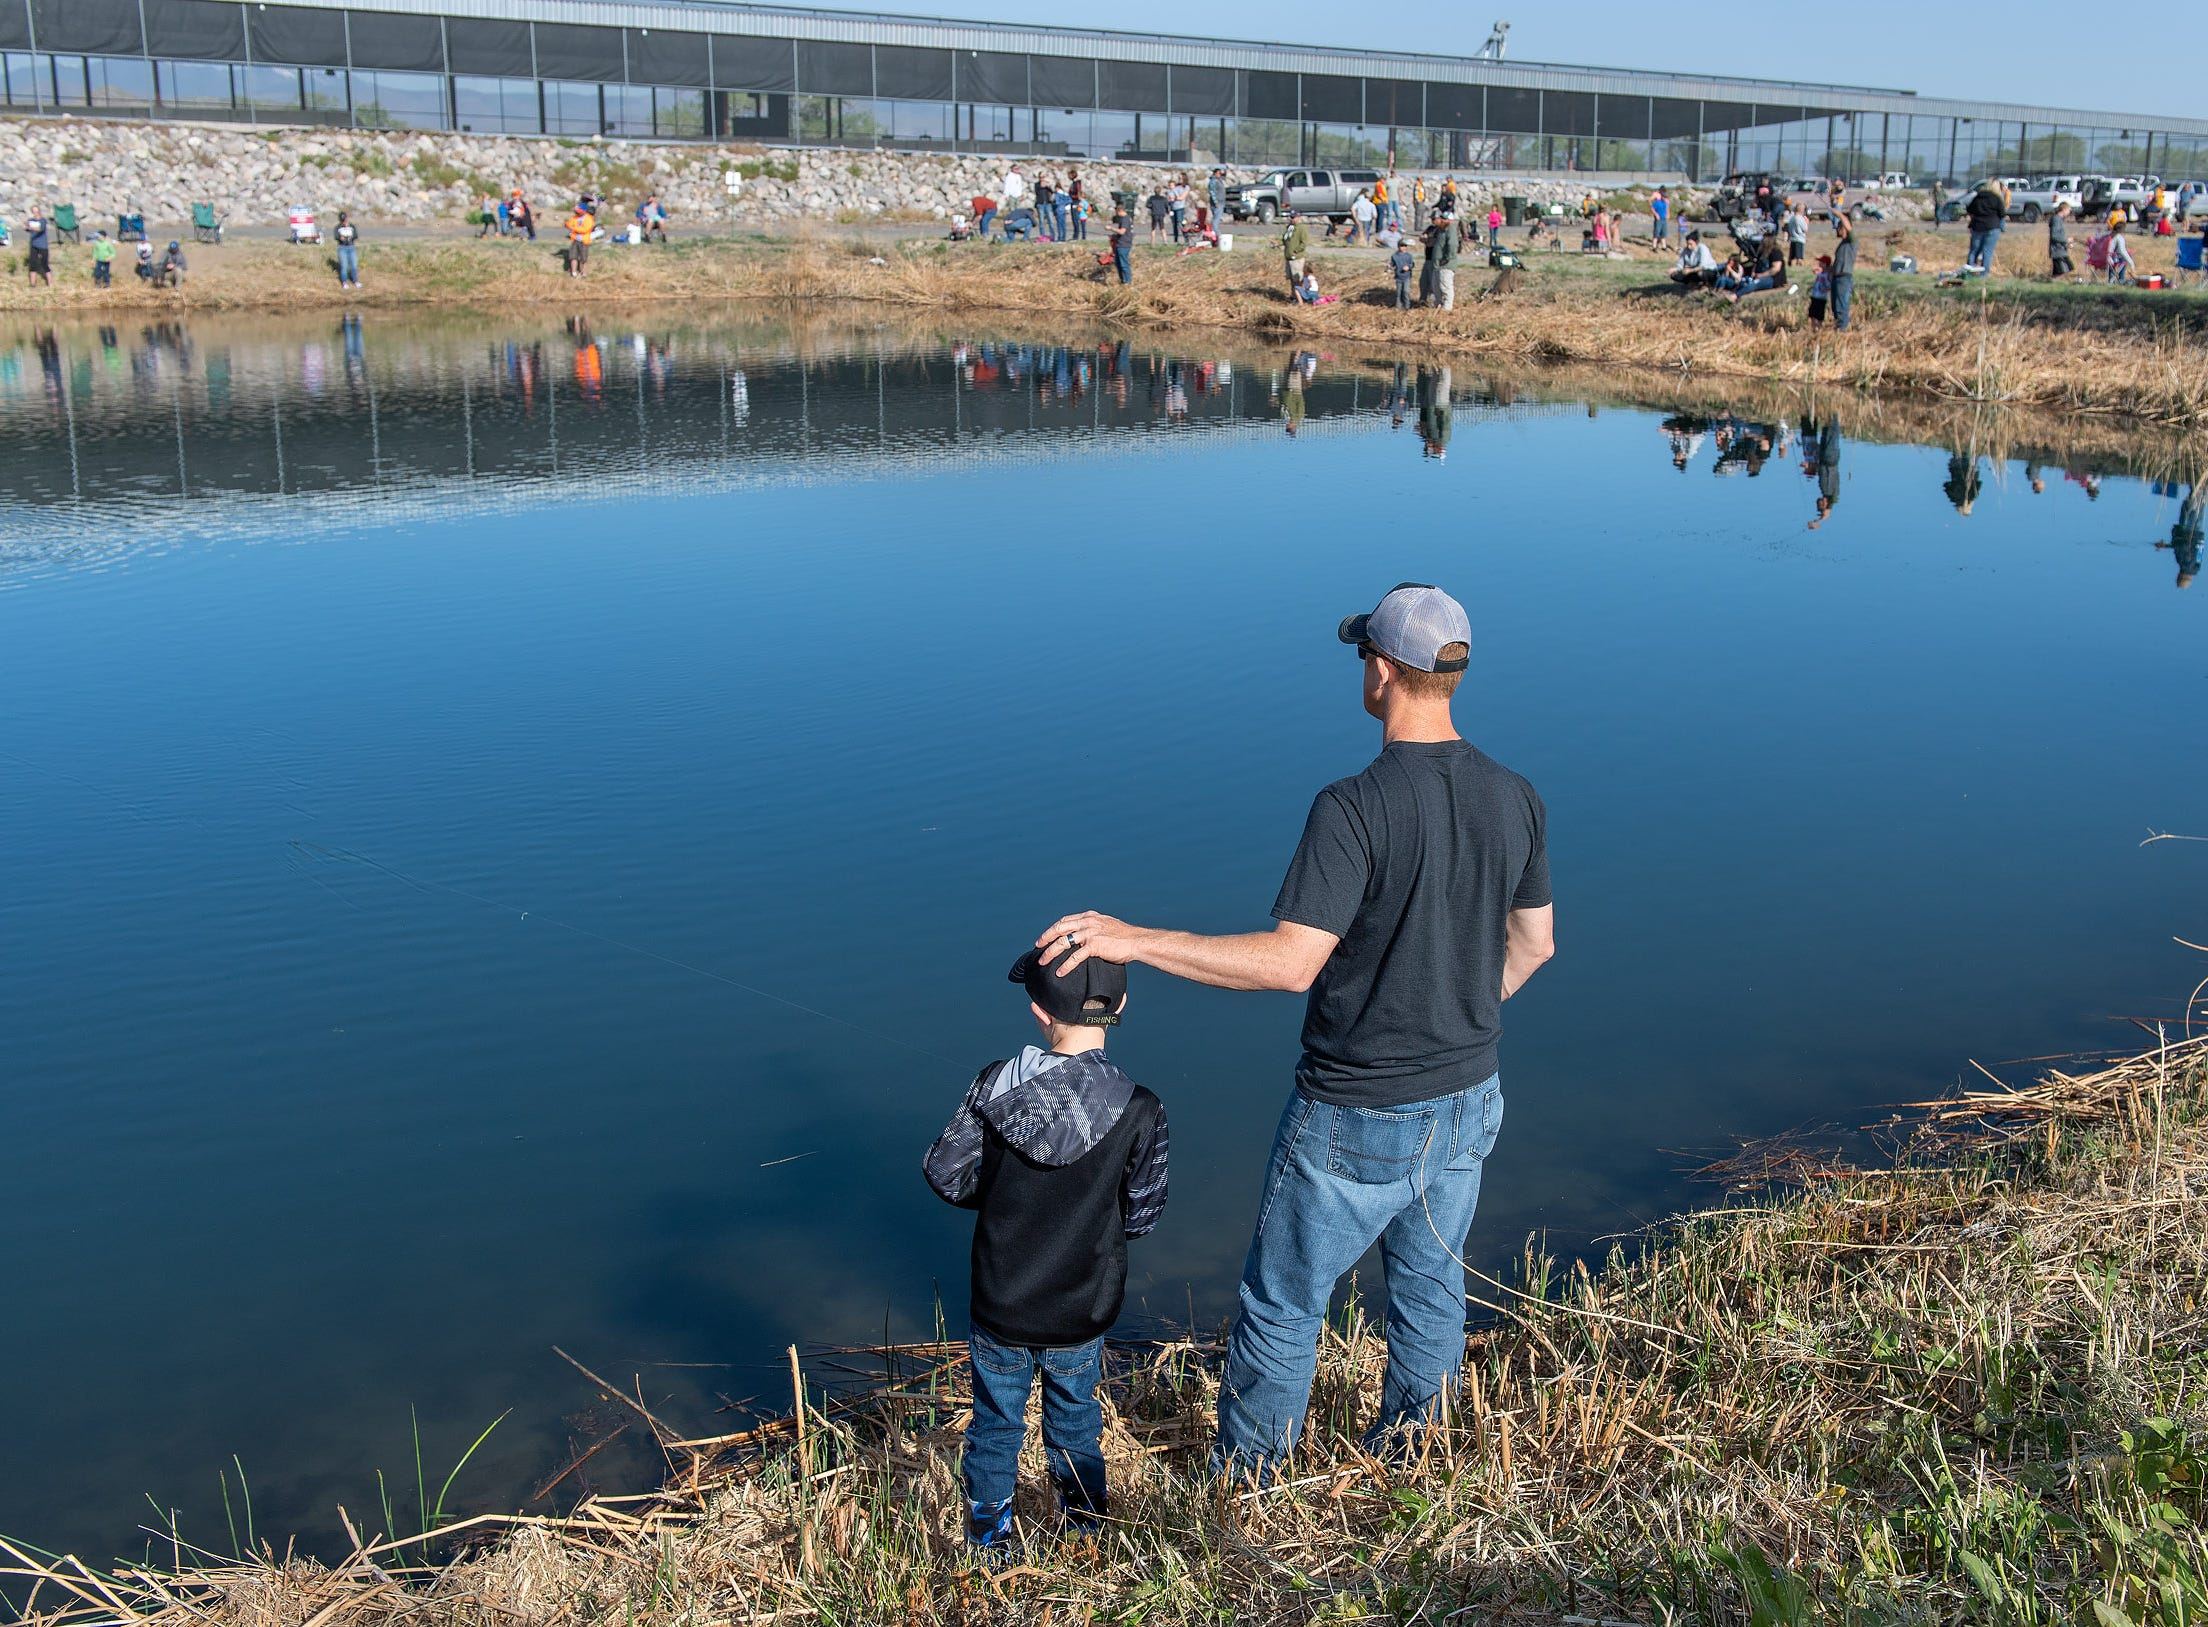 Colton Borsini, 5, and his dad Jason Borsini, from Yerington, fish the holding pond.